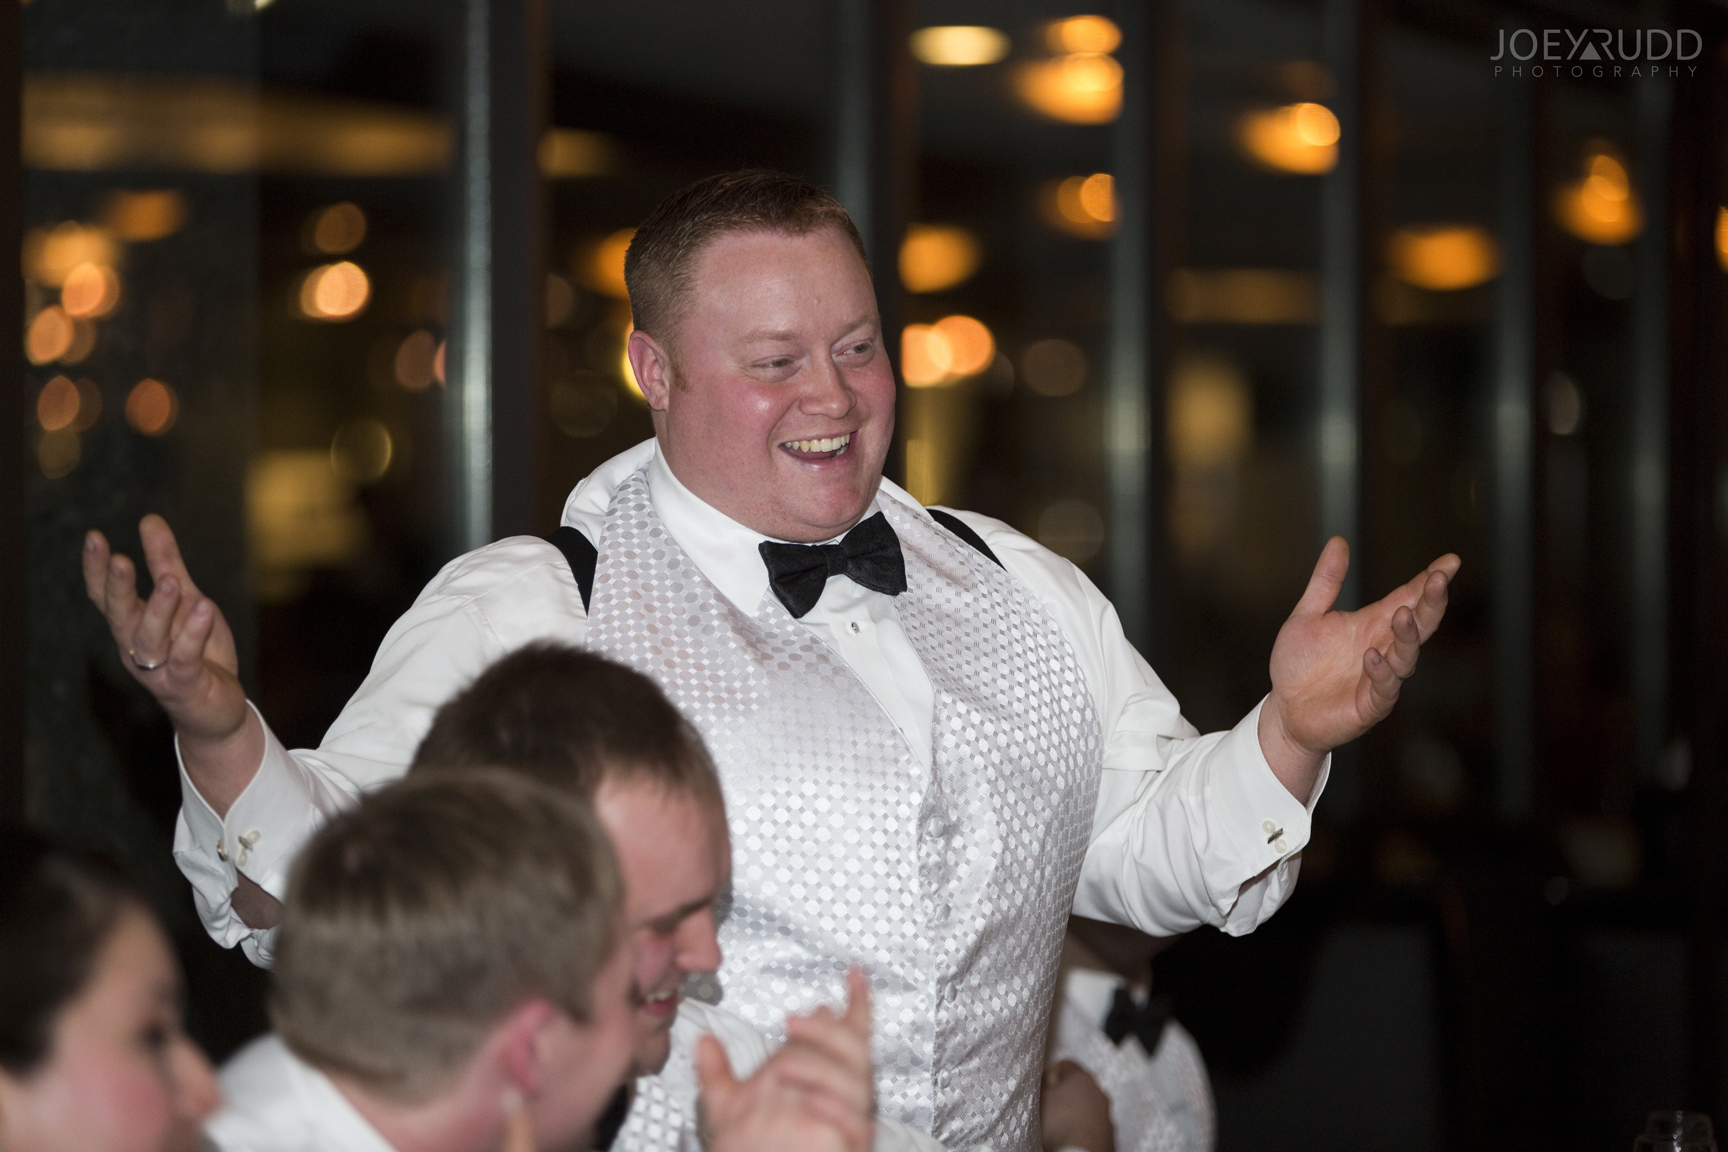 Best Wedding Photographer Joey Rudd Ottawa National Arts Centre